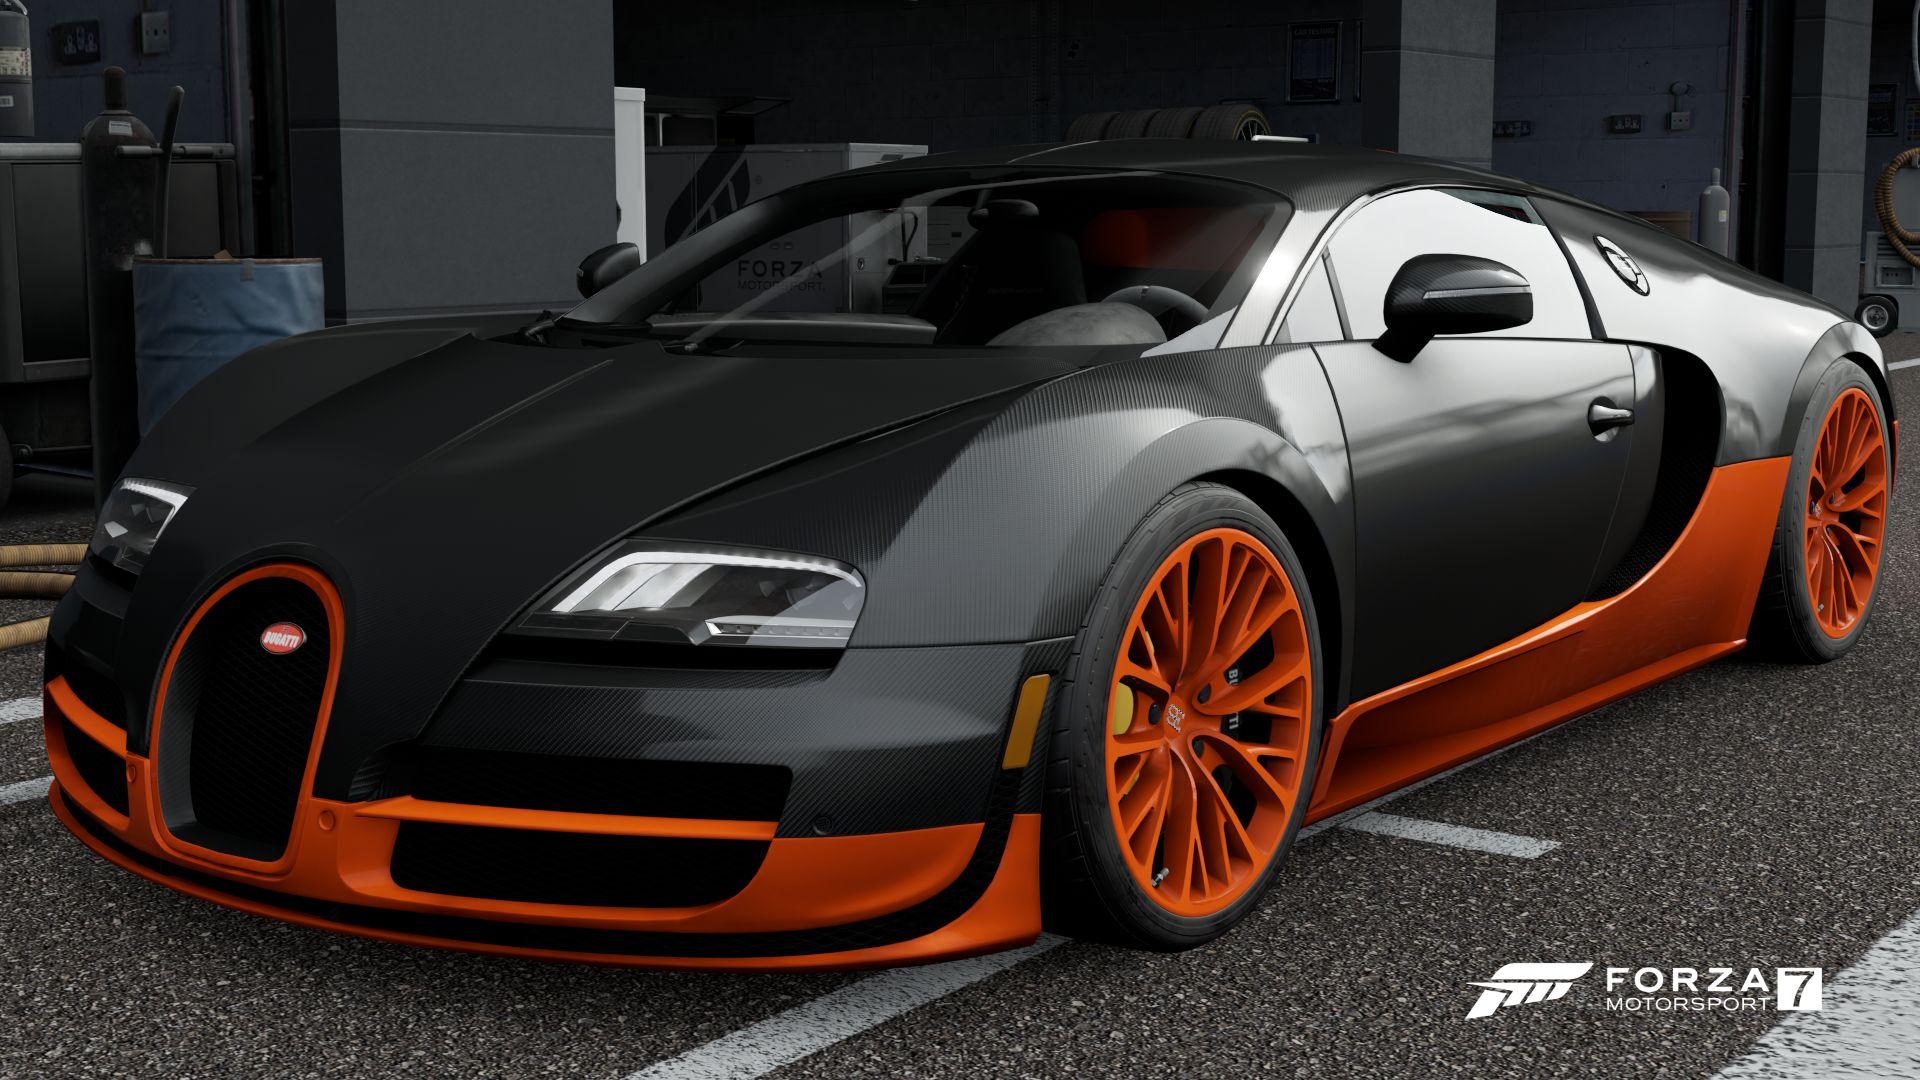 The 2011 Bugatti Veyron Super Sport In Forza Motorsport 7